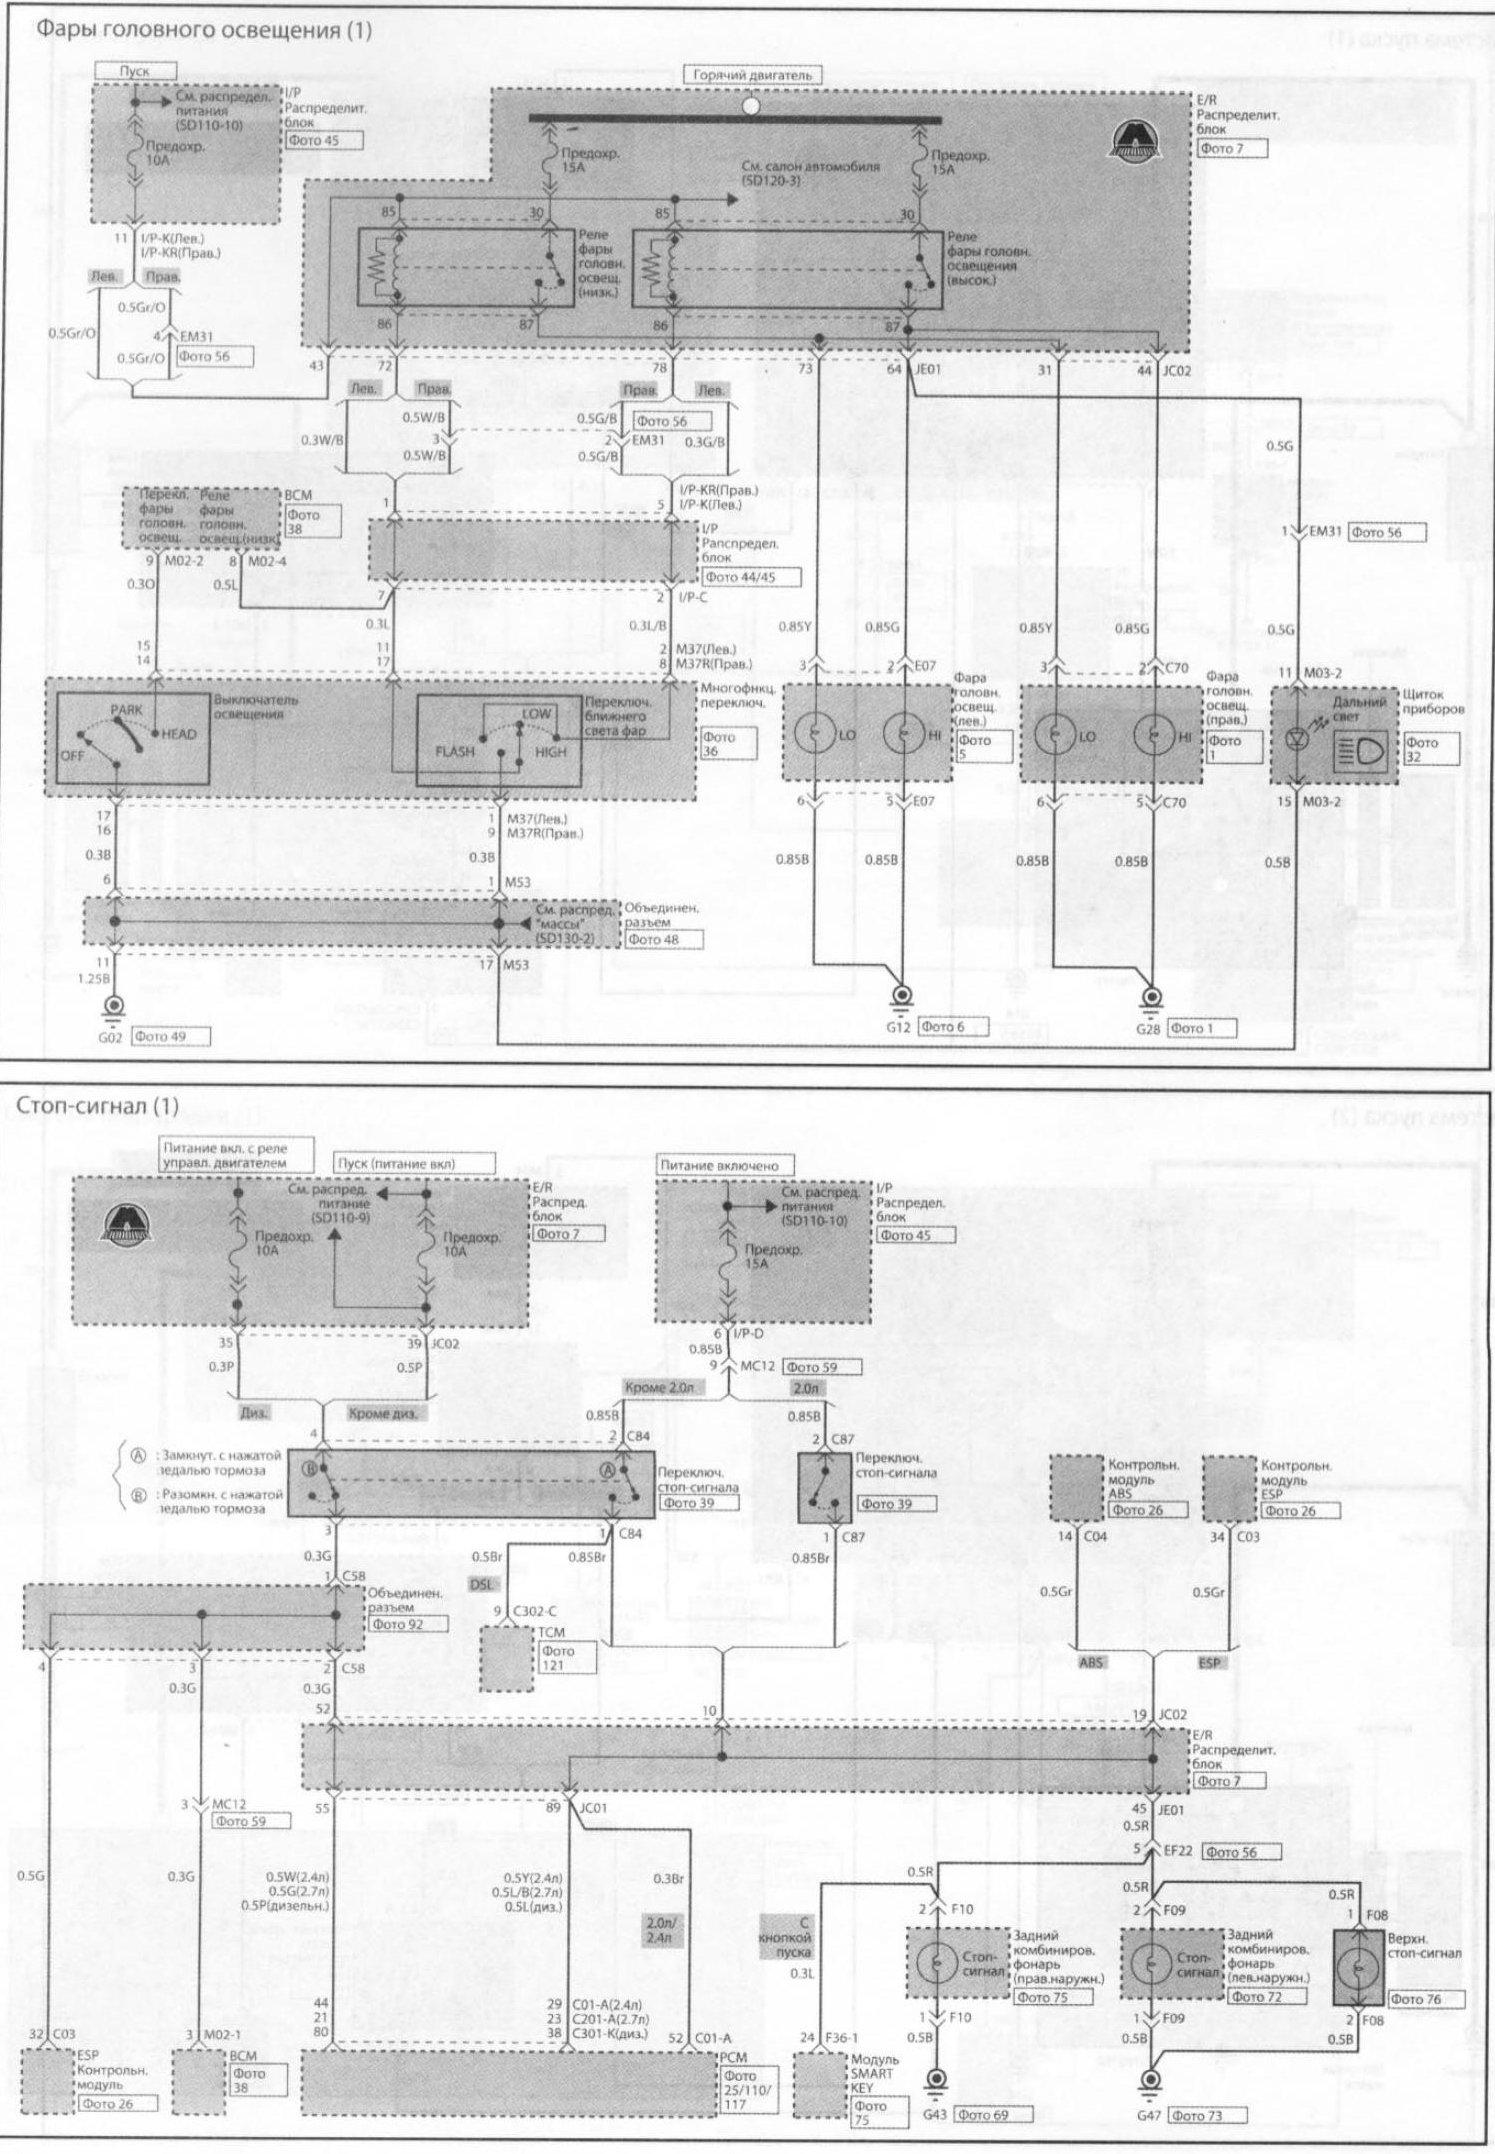 kia car manuals wiring diagrams pdf fault codes rh automotive manuals net Kia Electrical Wiring Diagram 2010 Kia Optima Stereo Wiring Diagram